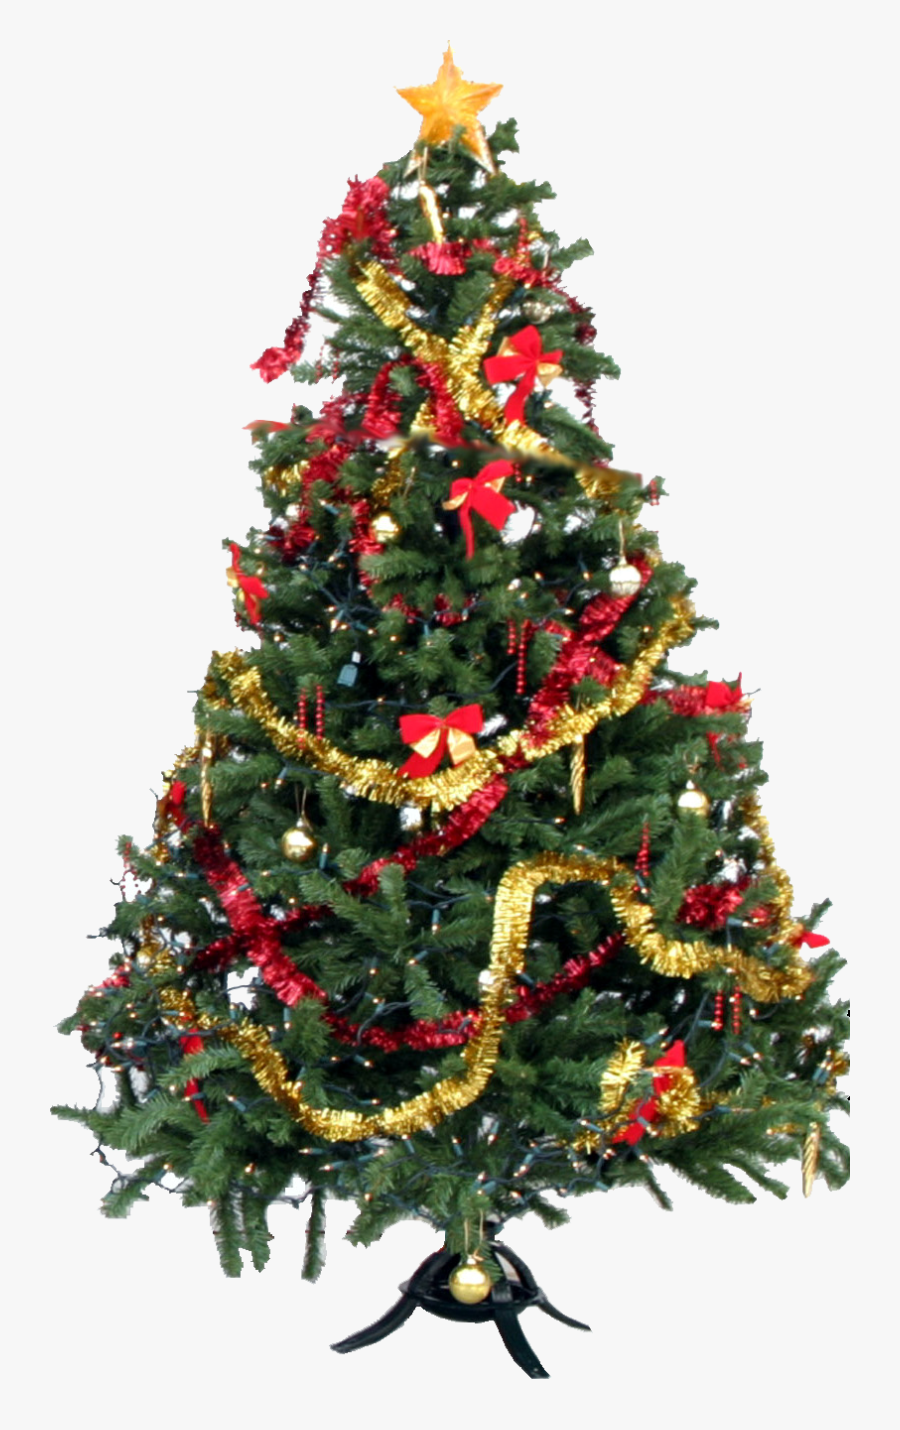 25 December Christmas Day, Transparent Clipart